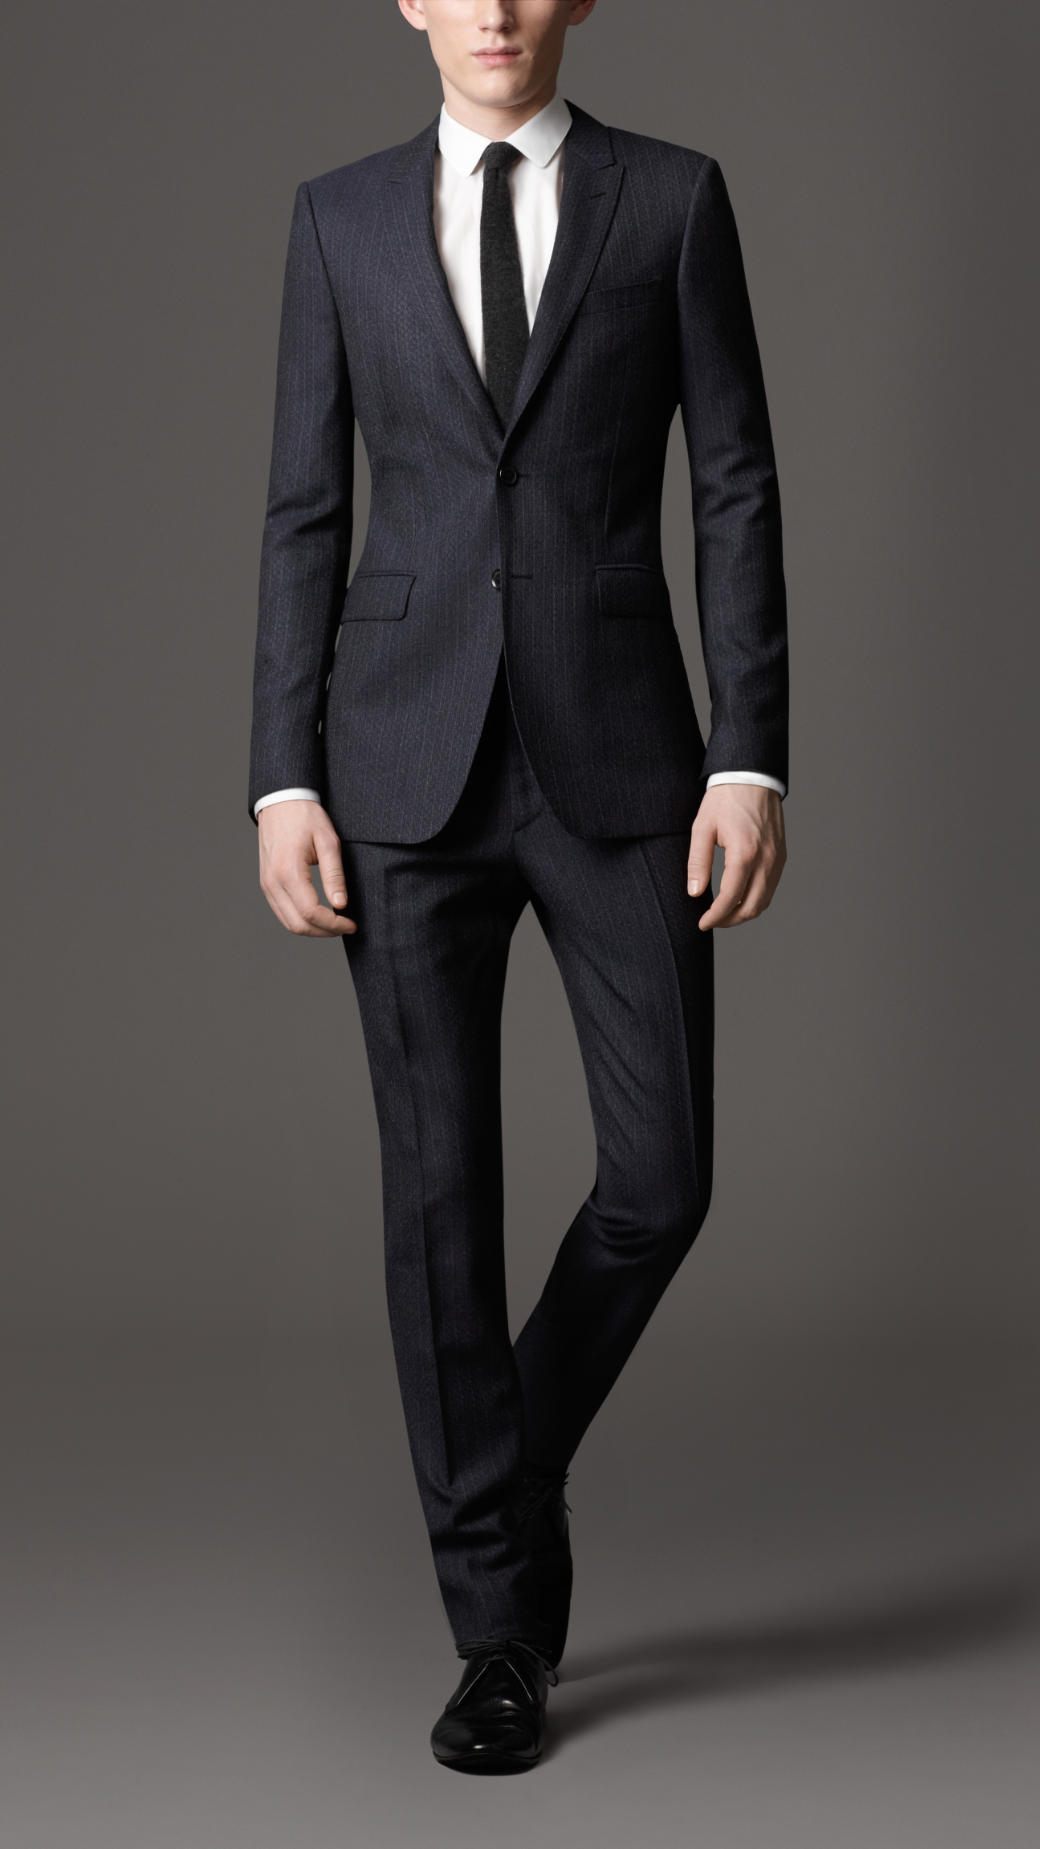 a50333da7d6 Lyst - Burberry Slim Fit Virgin Wool Stripe Suit in Blue .